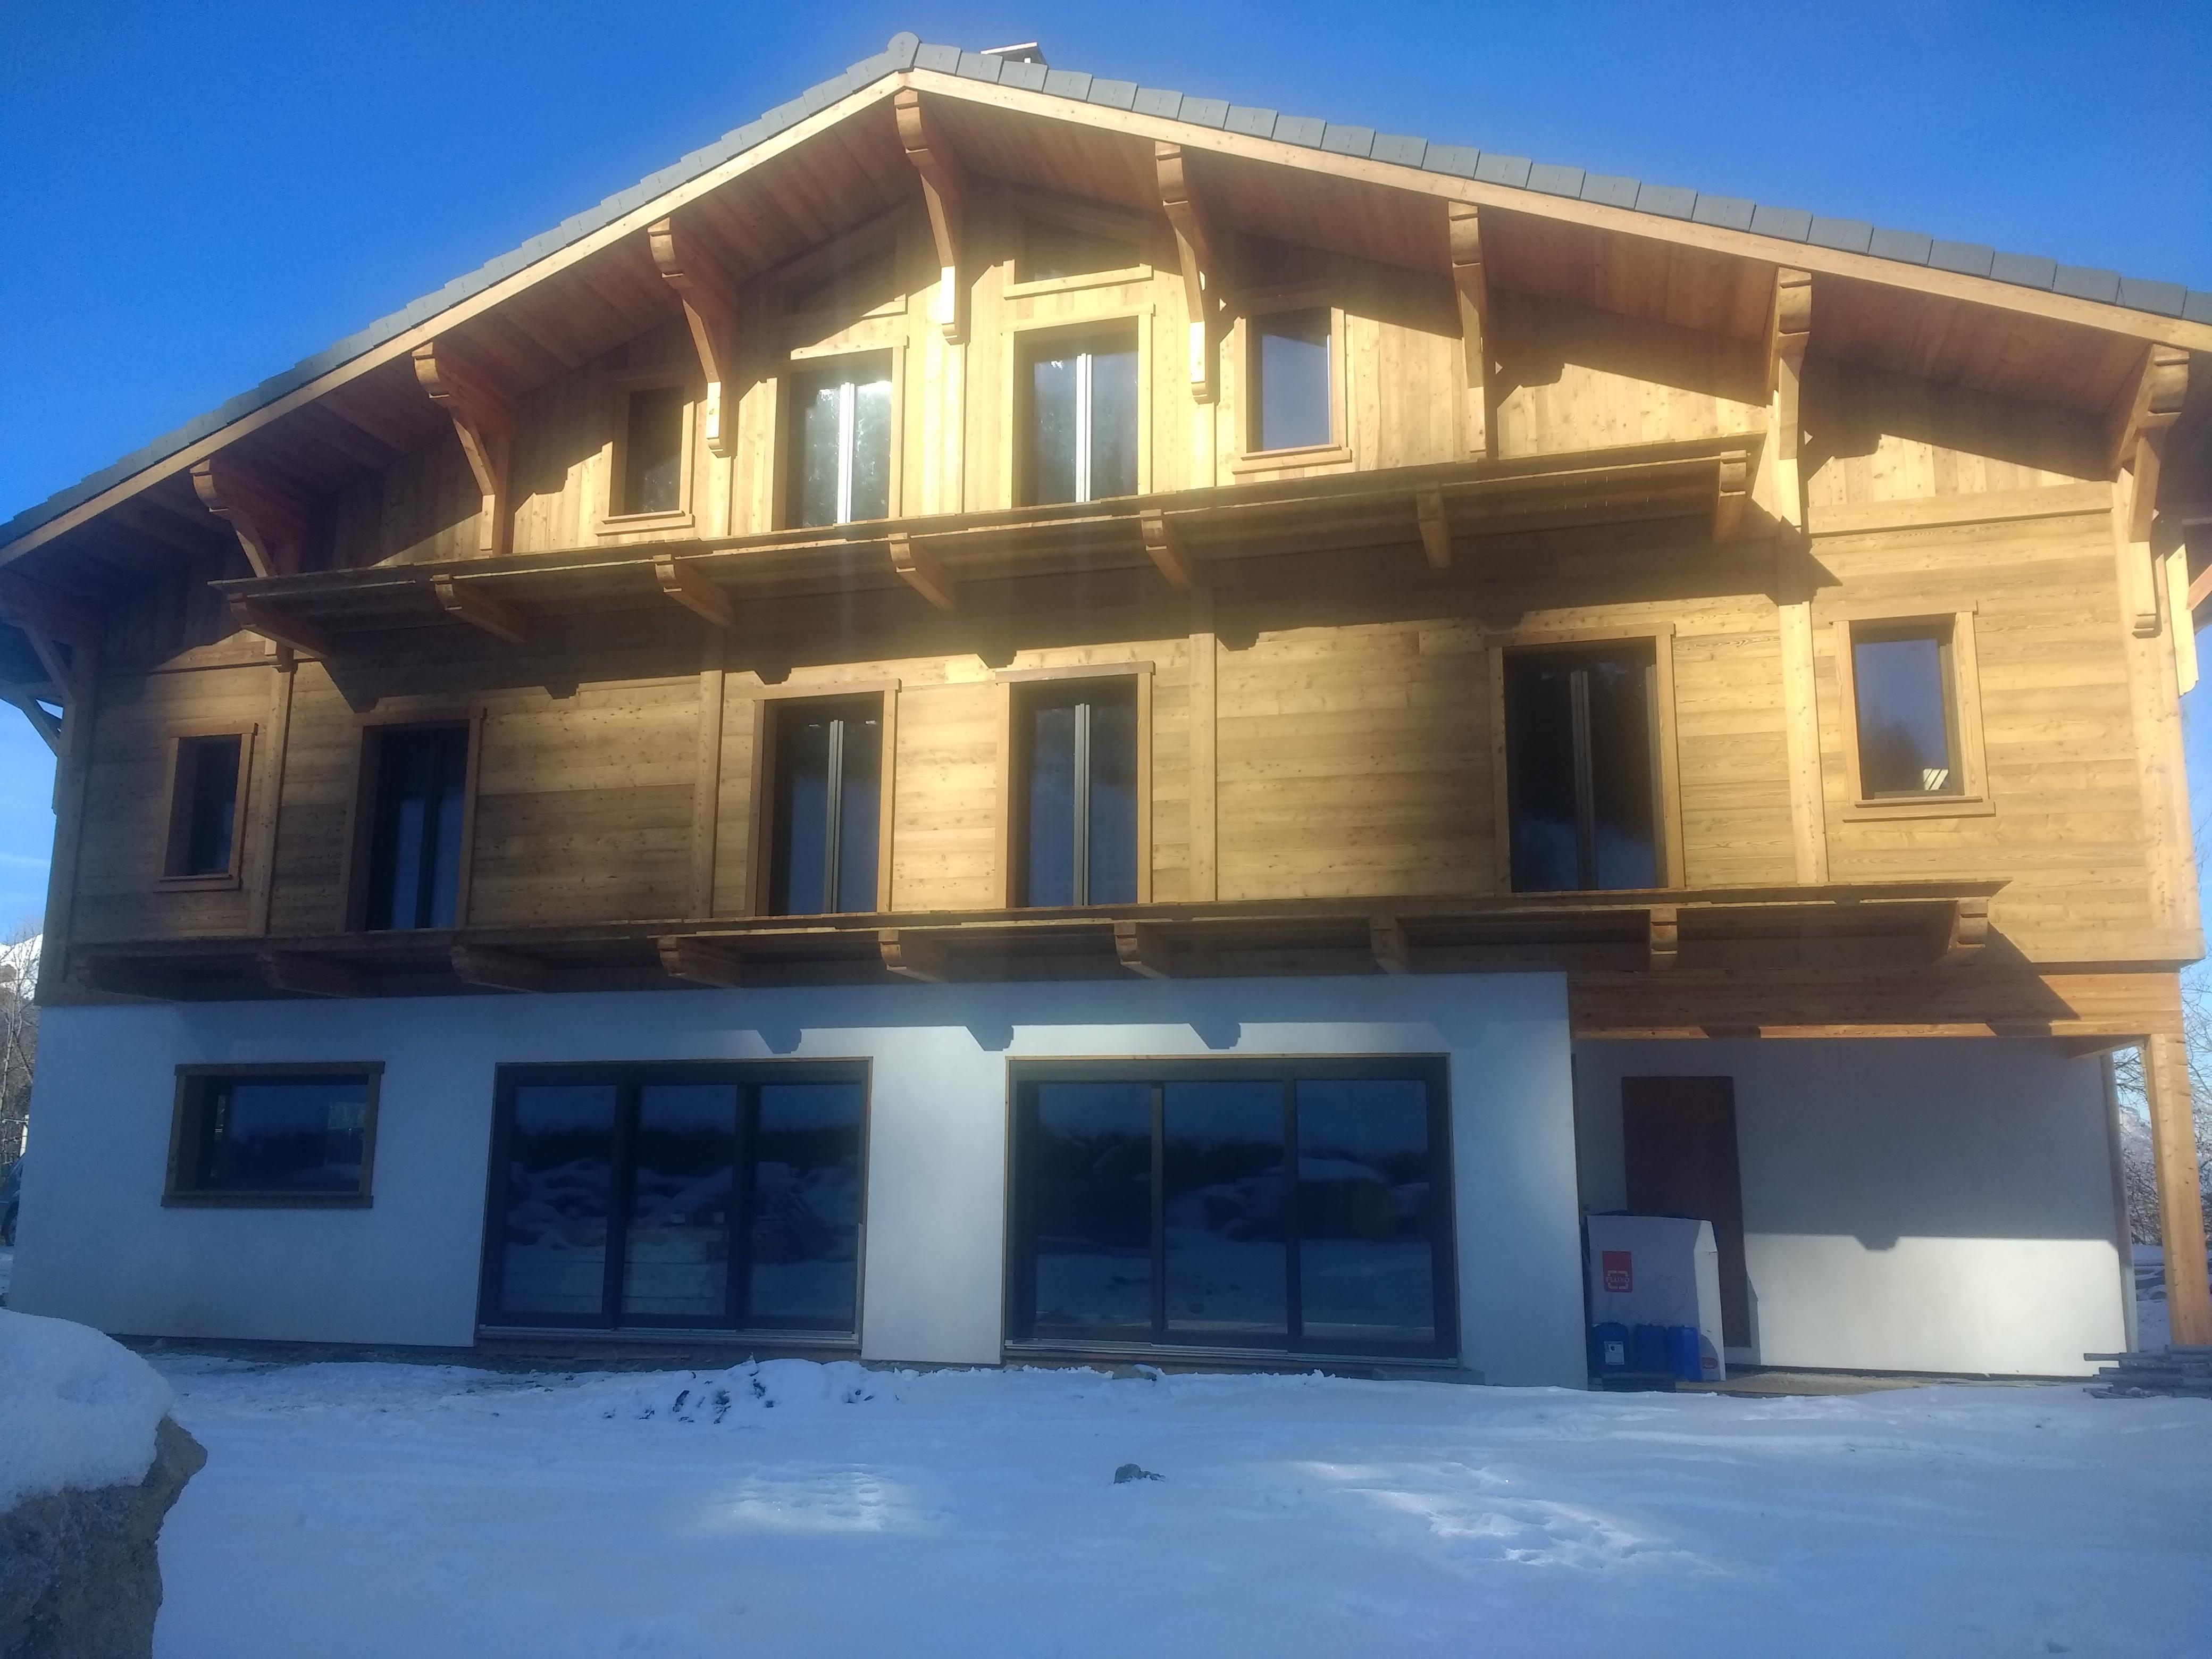 Ski chalet design build